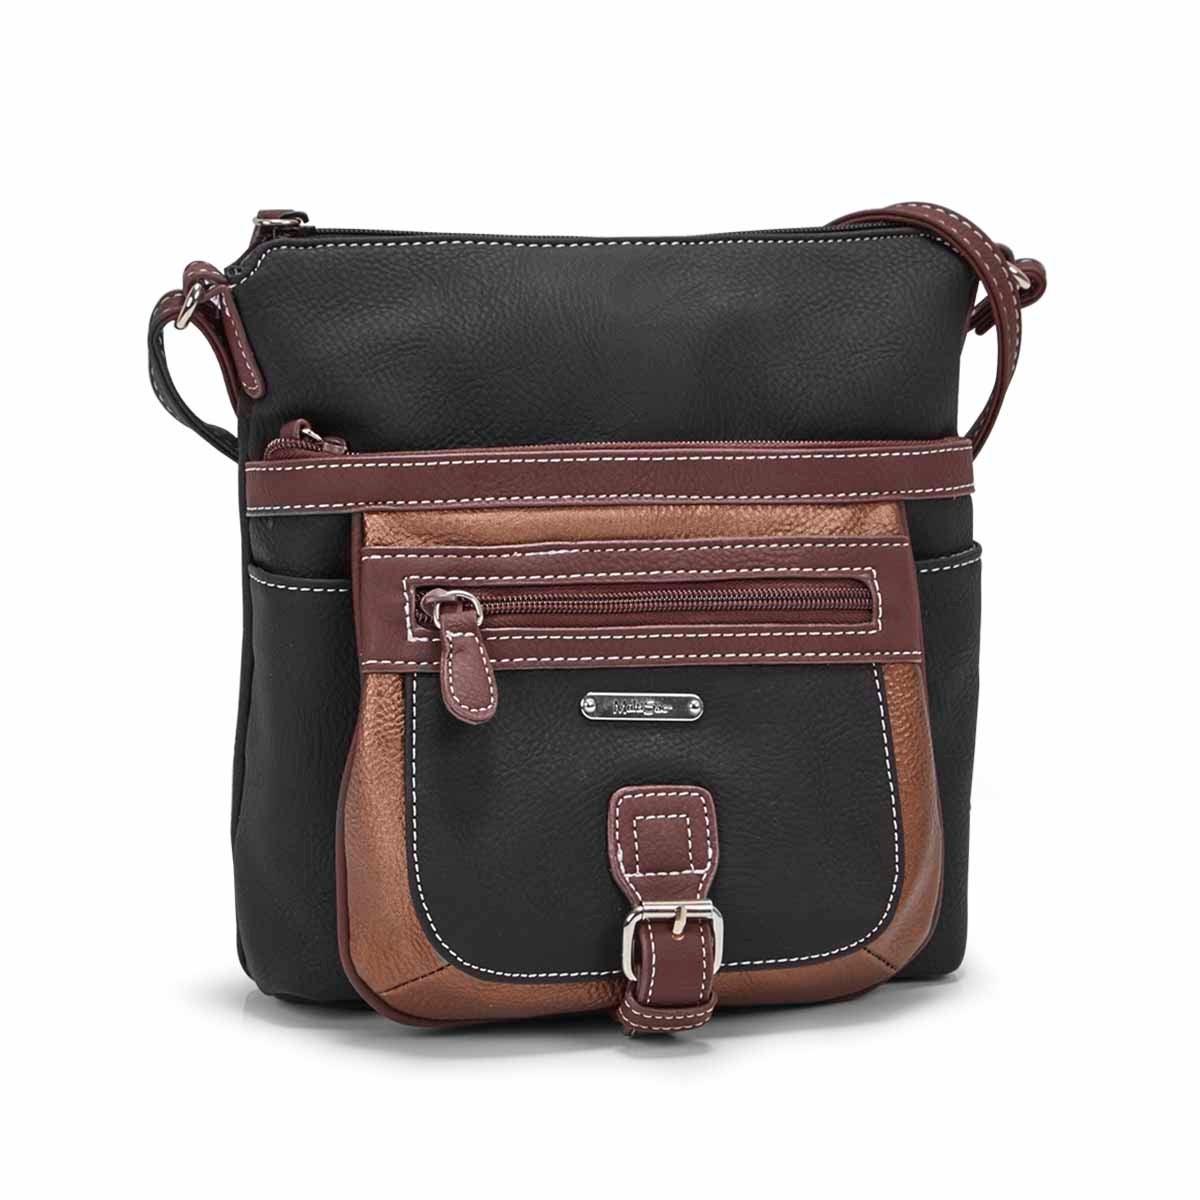 Women's MINI FLARE bronze/black crossbody bag